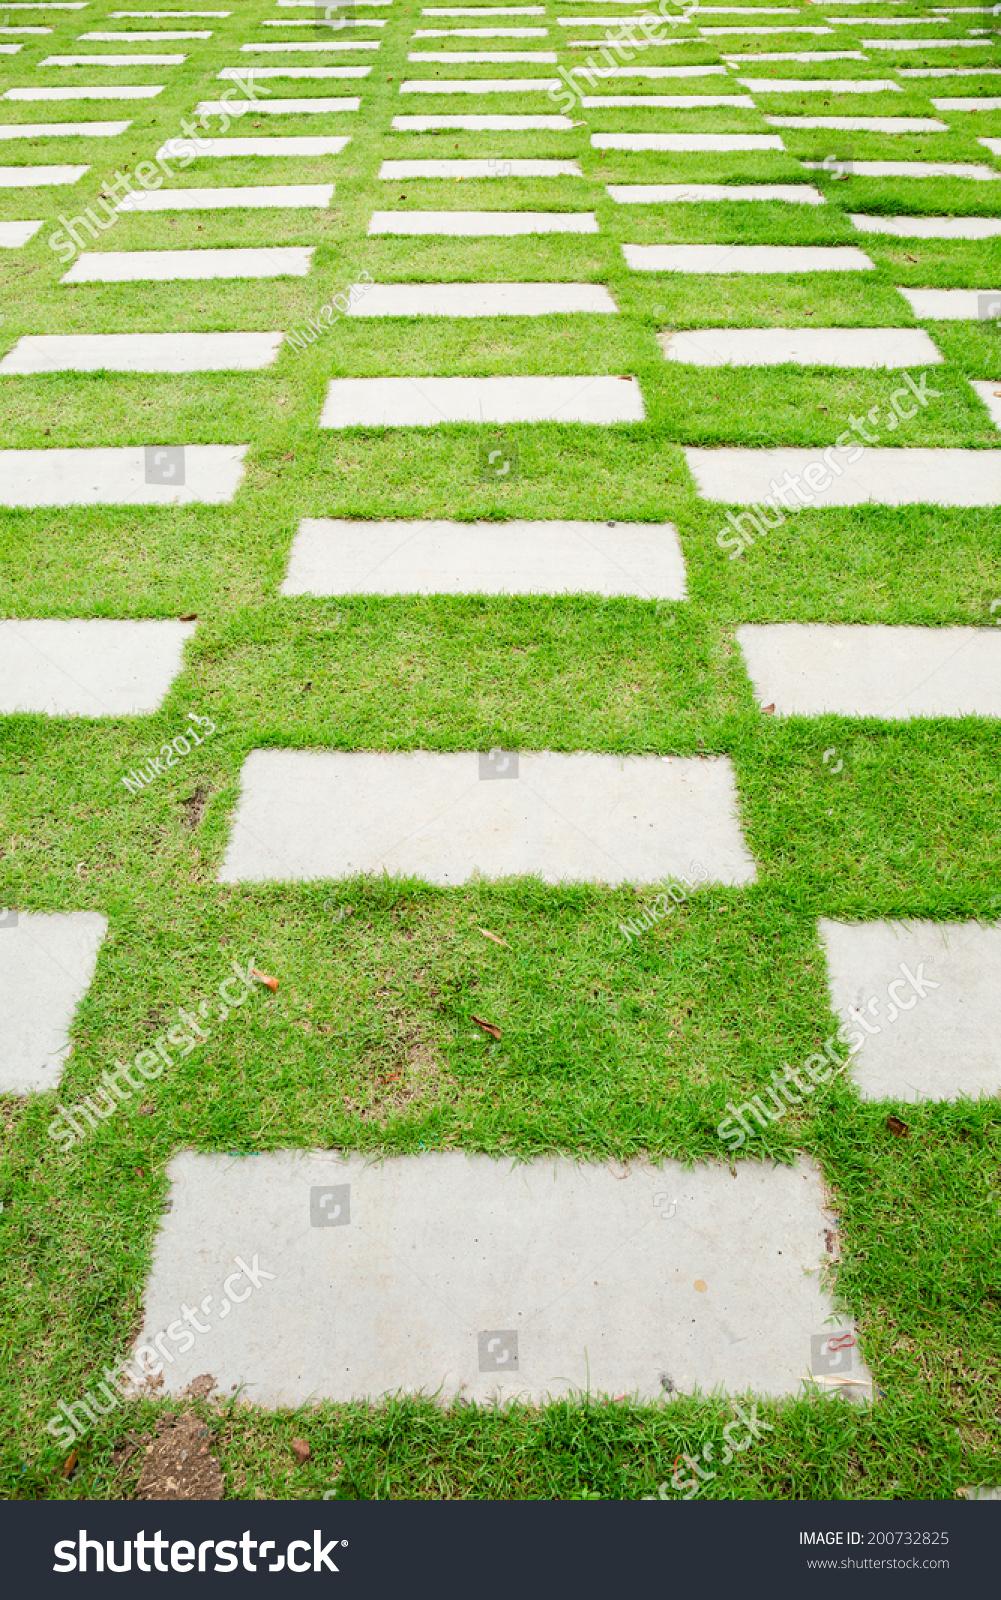 Cement footpath green grass yard stock photo 200732825 shutterstock cement footpath in green grass yard workwithnaturefo